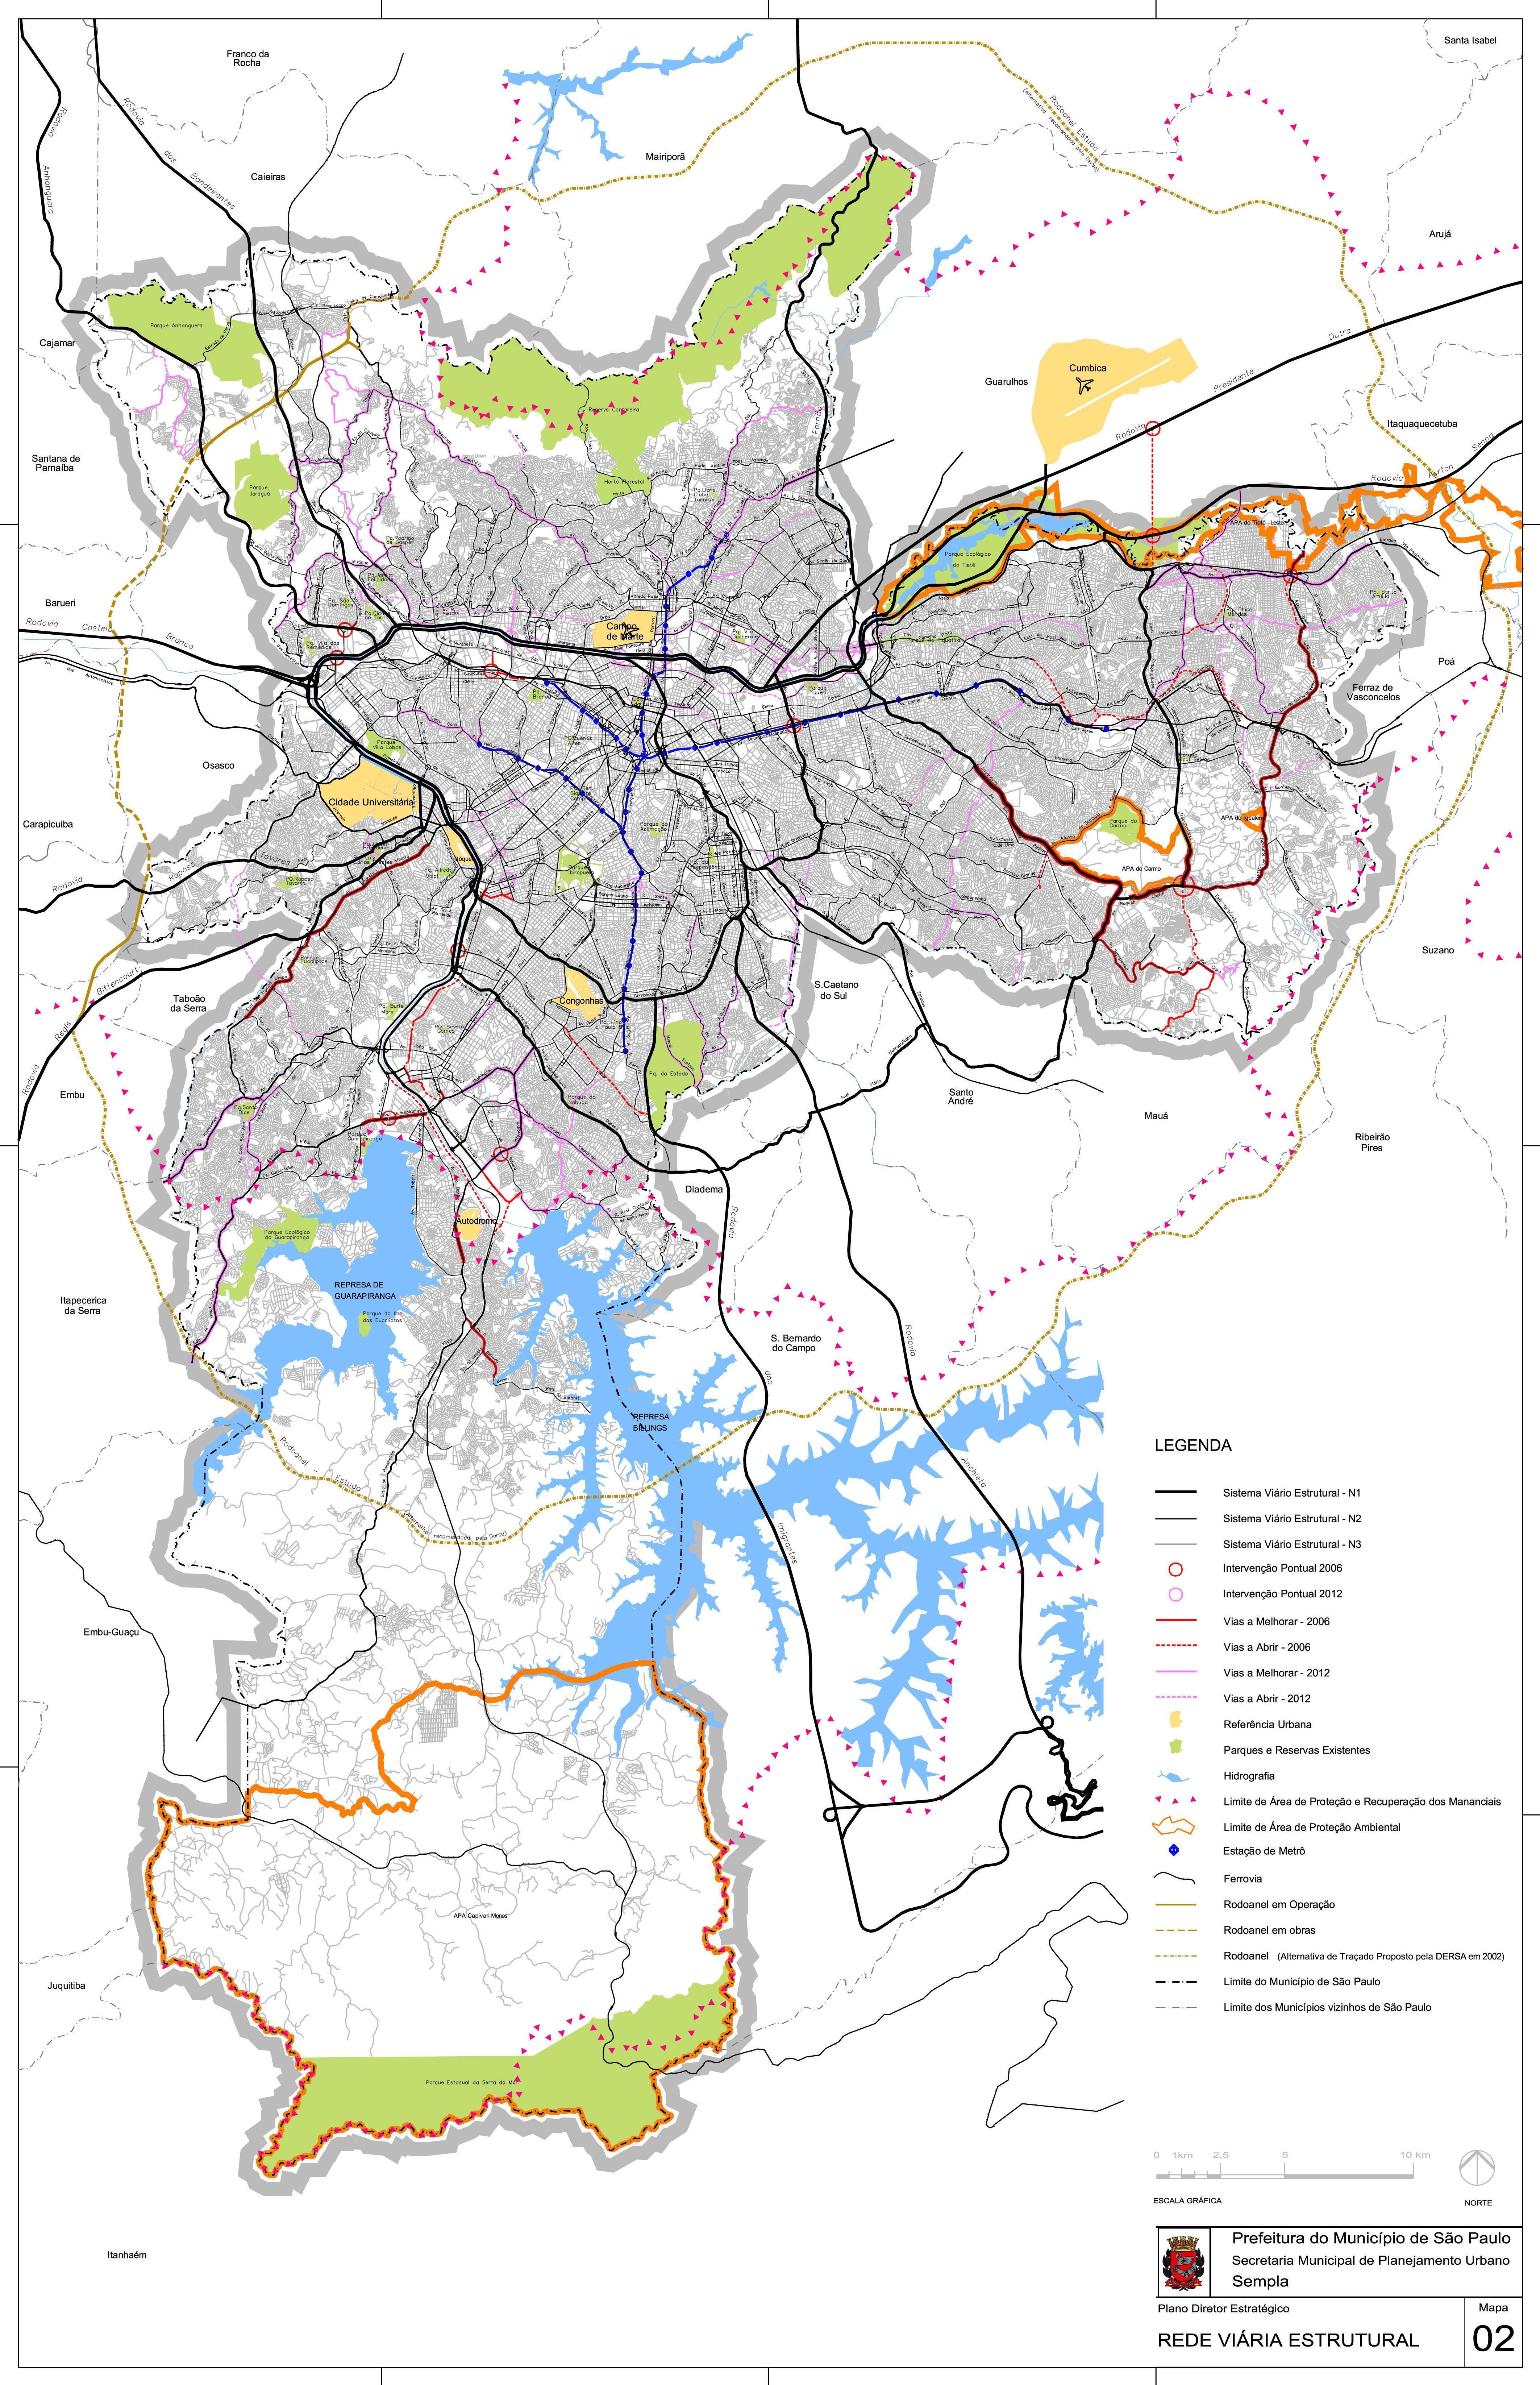 São Paulo City Street & Road Network Map, Brazil